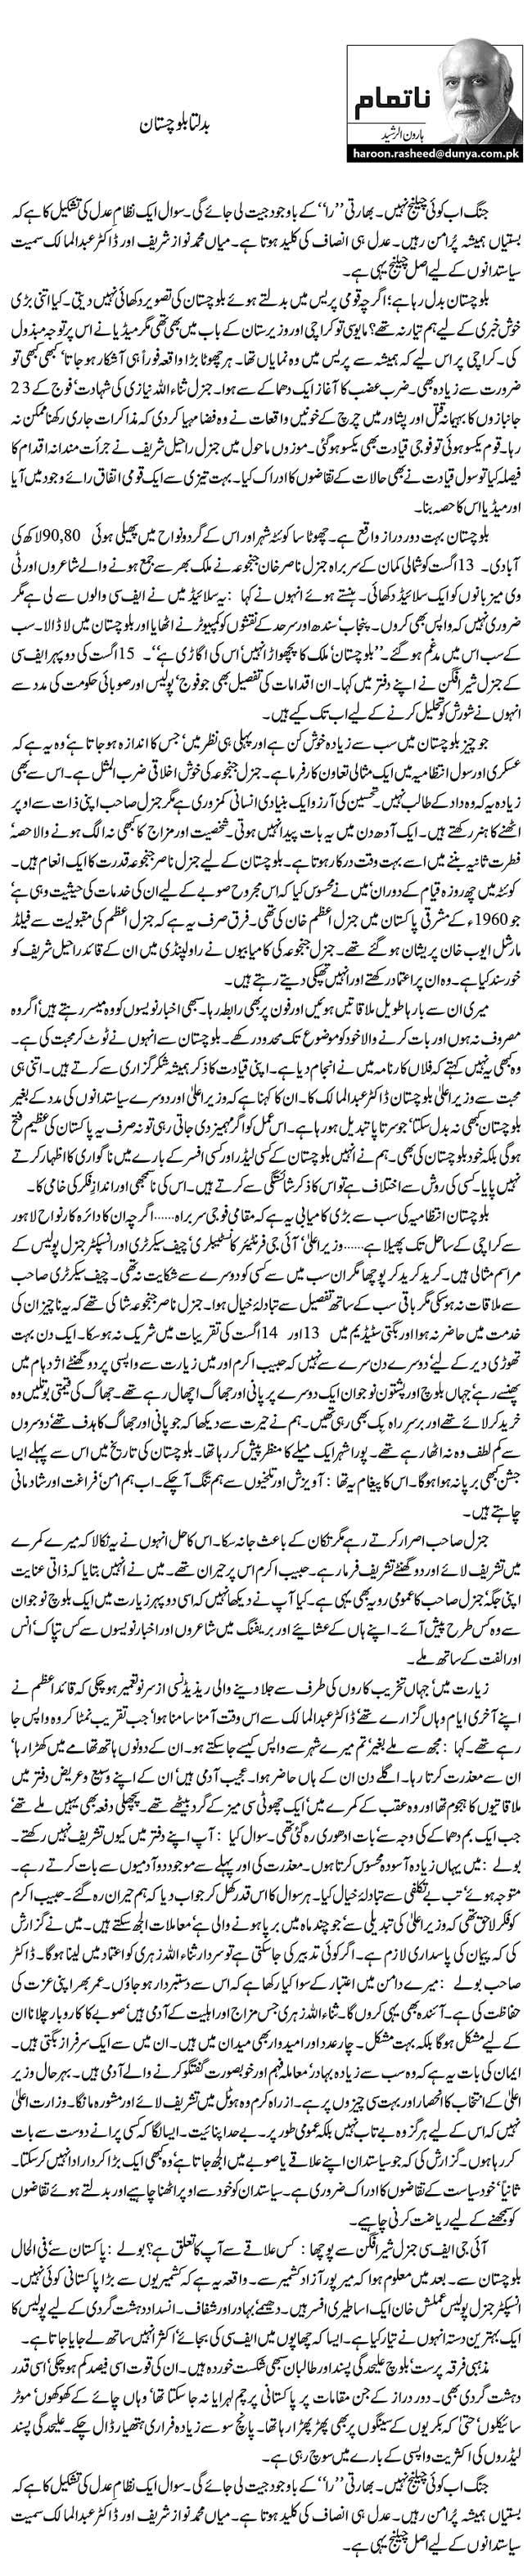 بدلتا بلوچستان